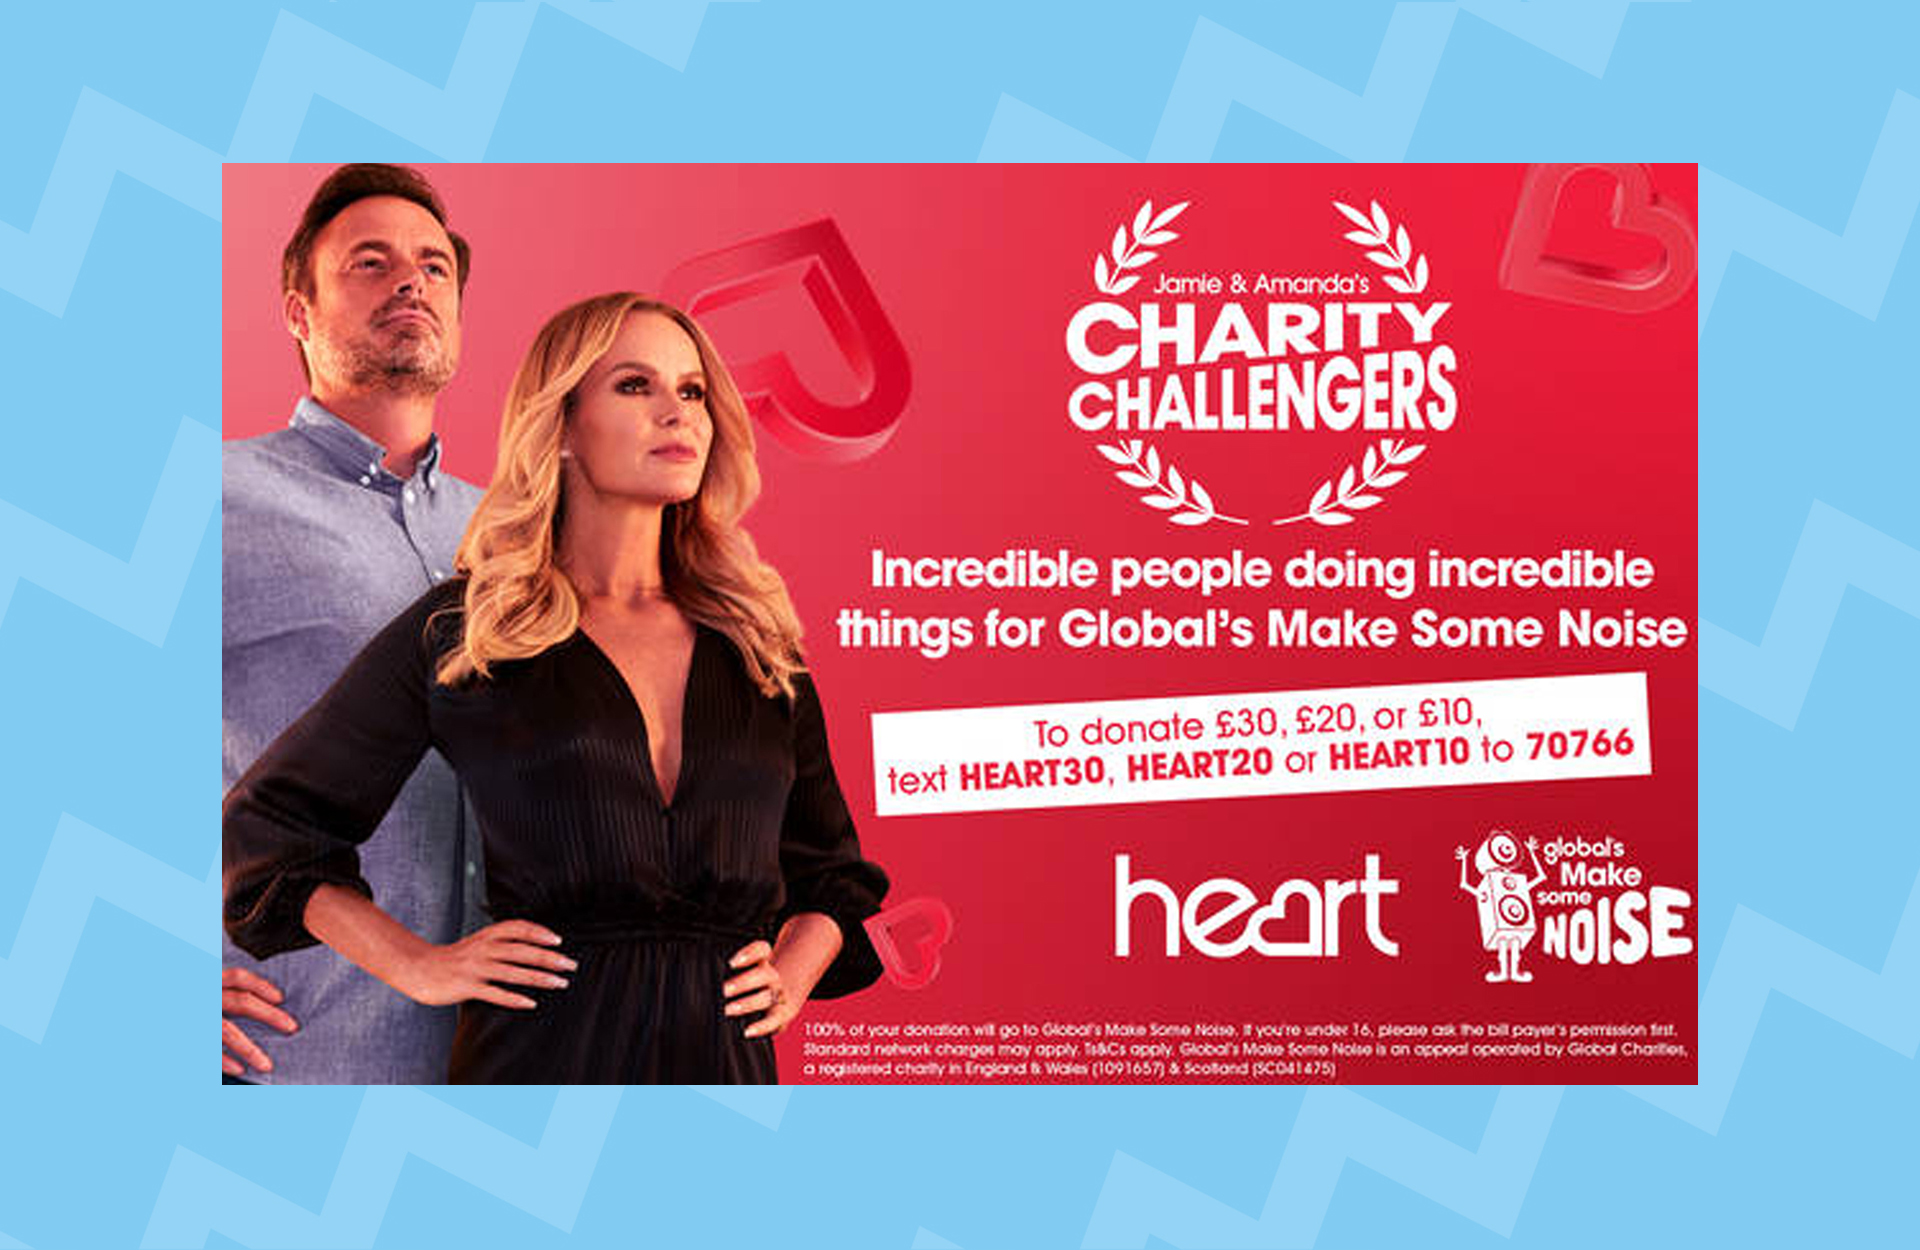 Meet Jamie and Amanda's Charity Challengers